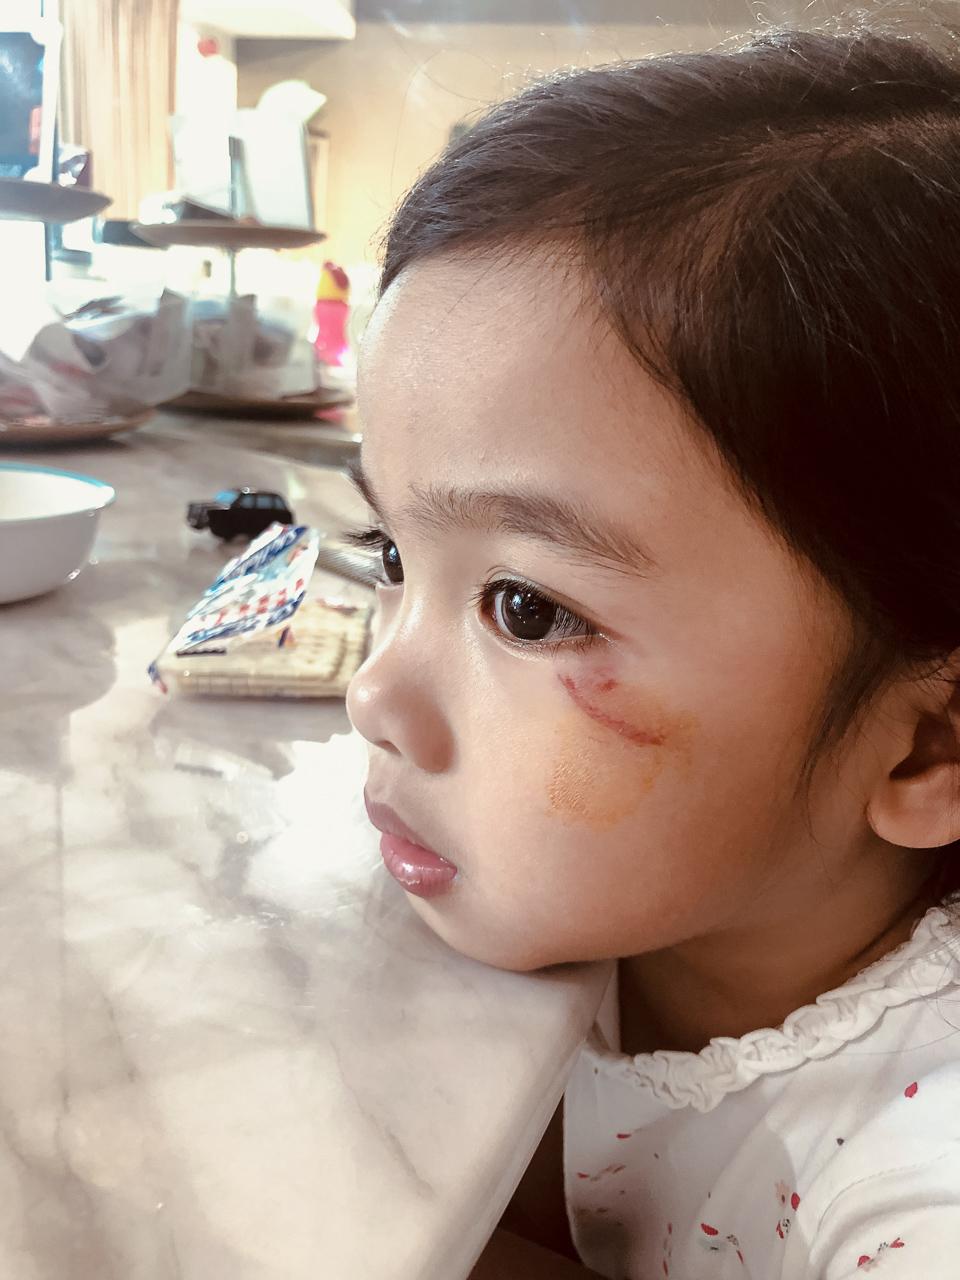 toddler injured in school